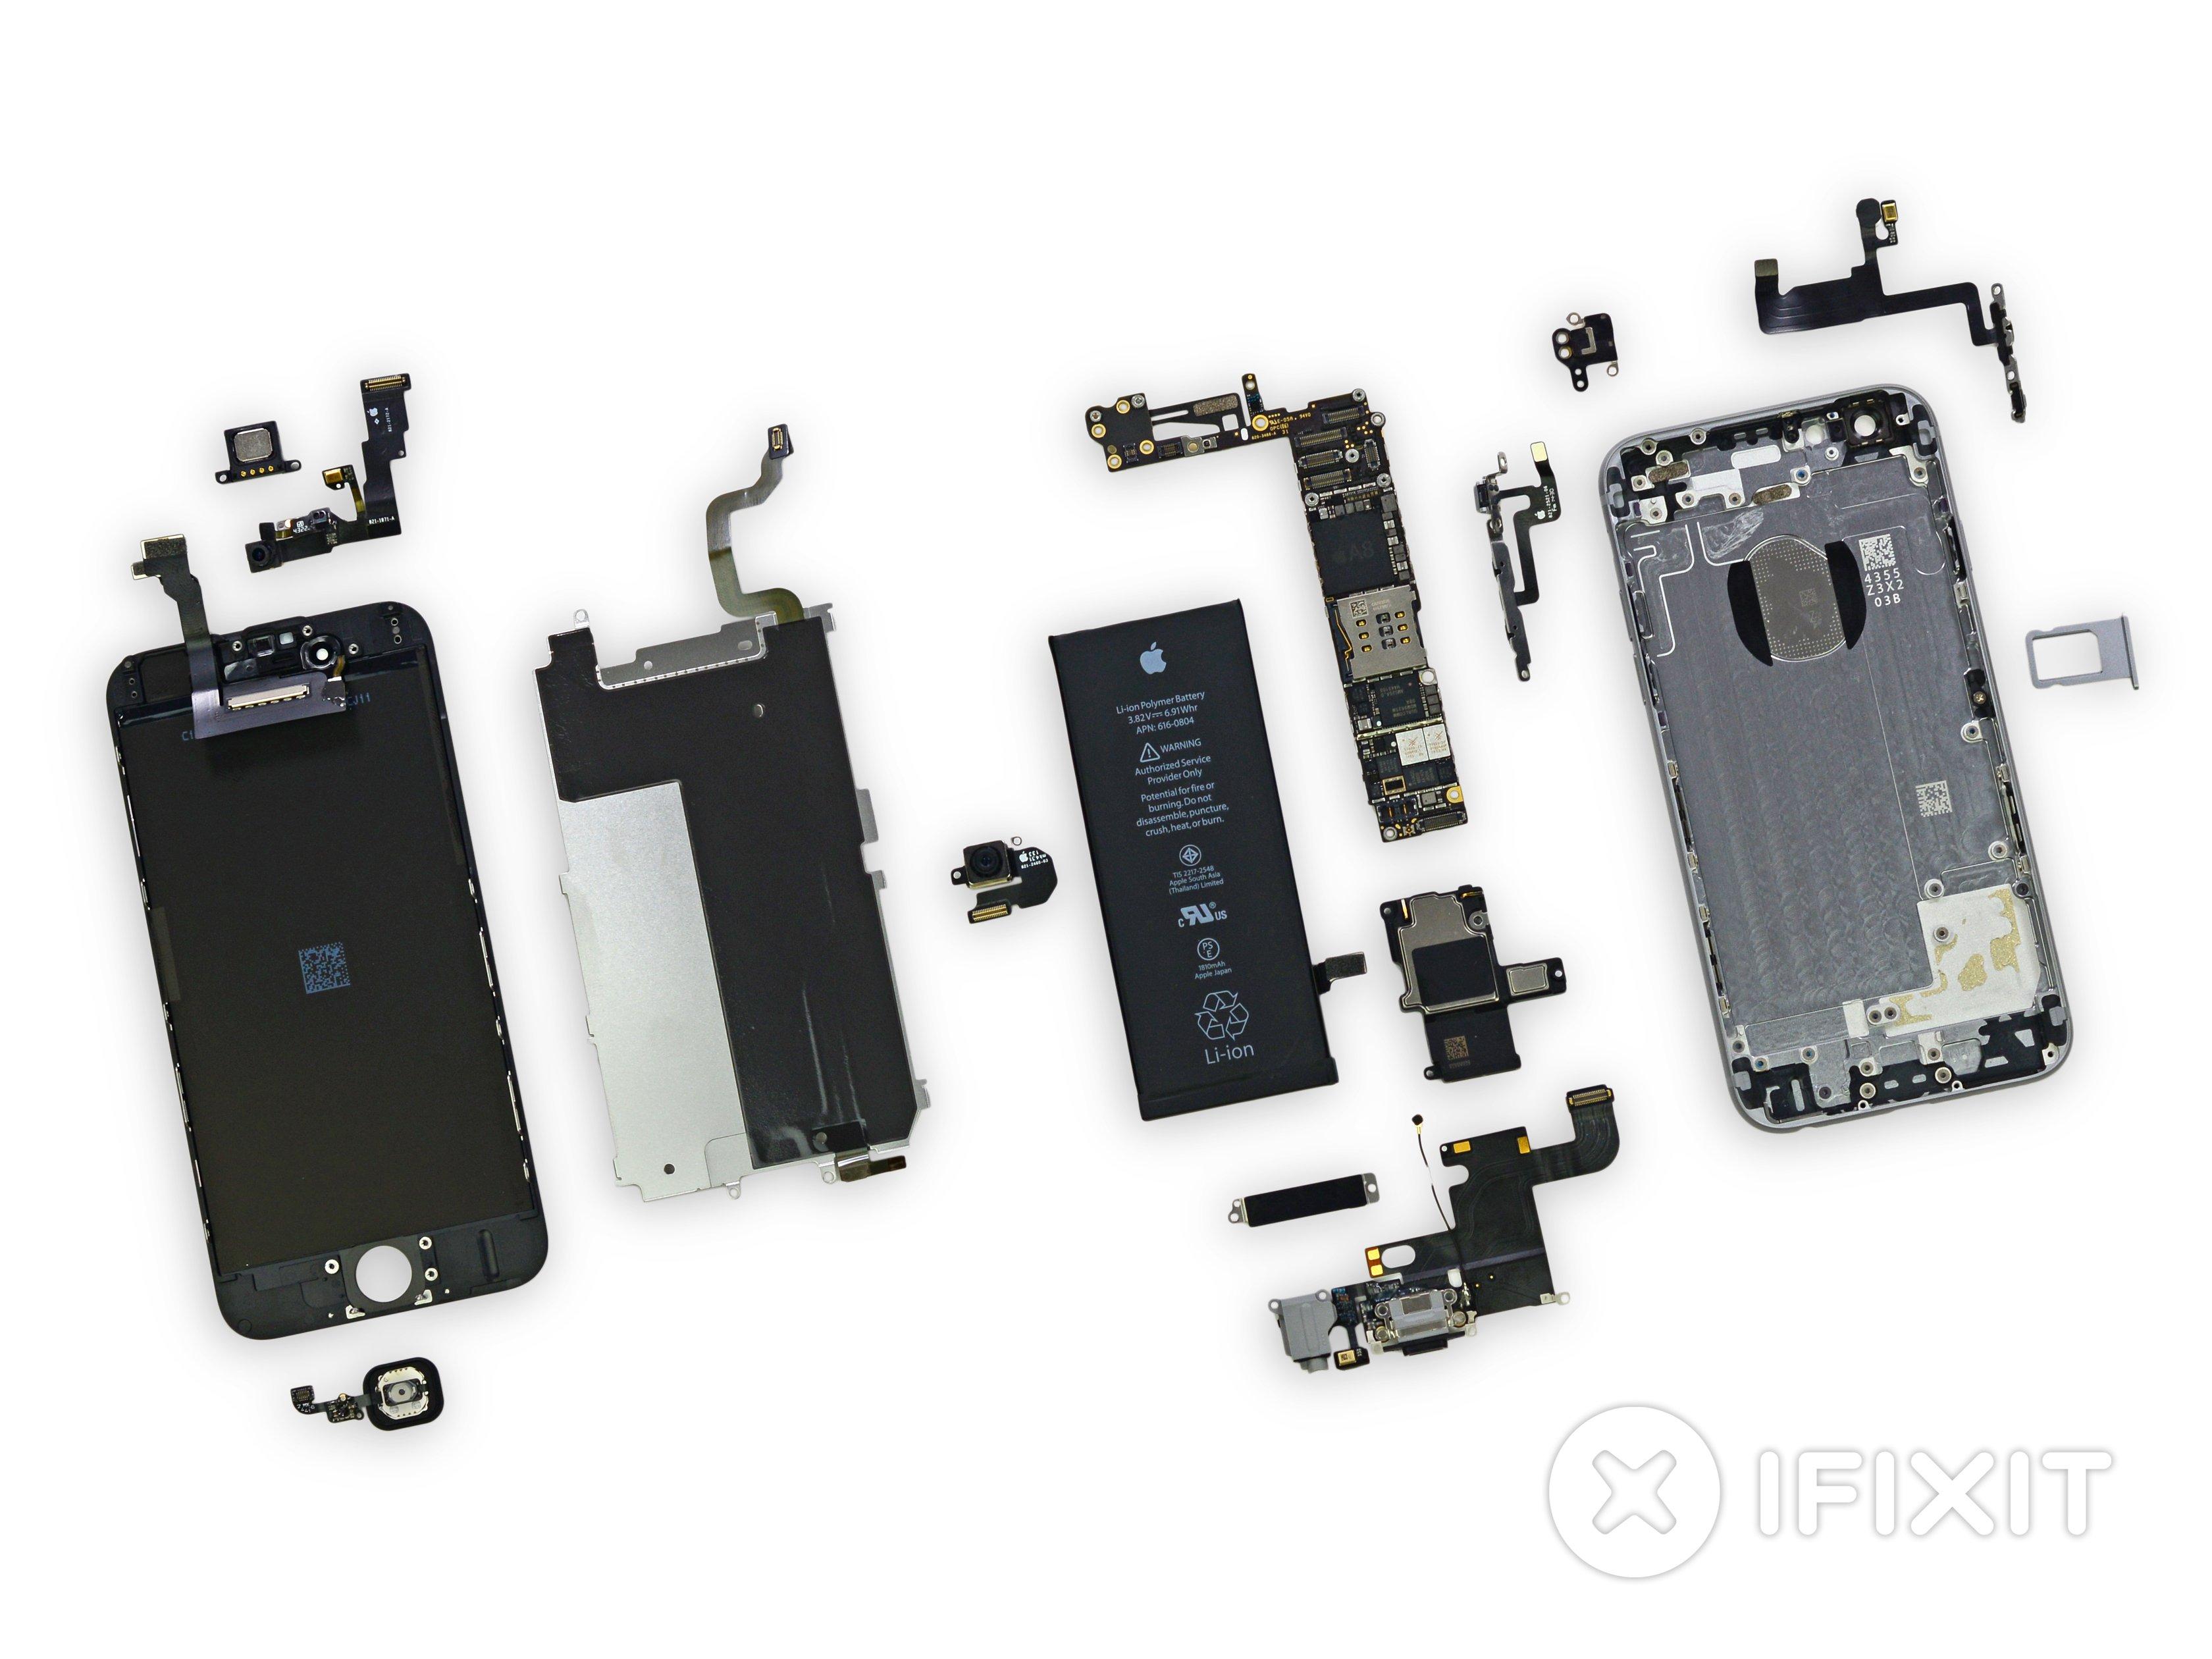 Айфон 6 плюс схема